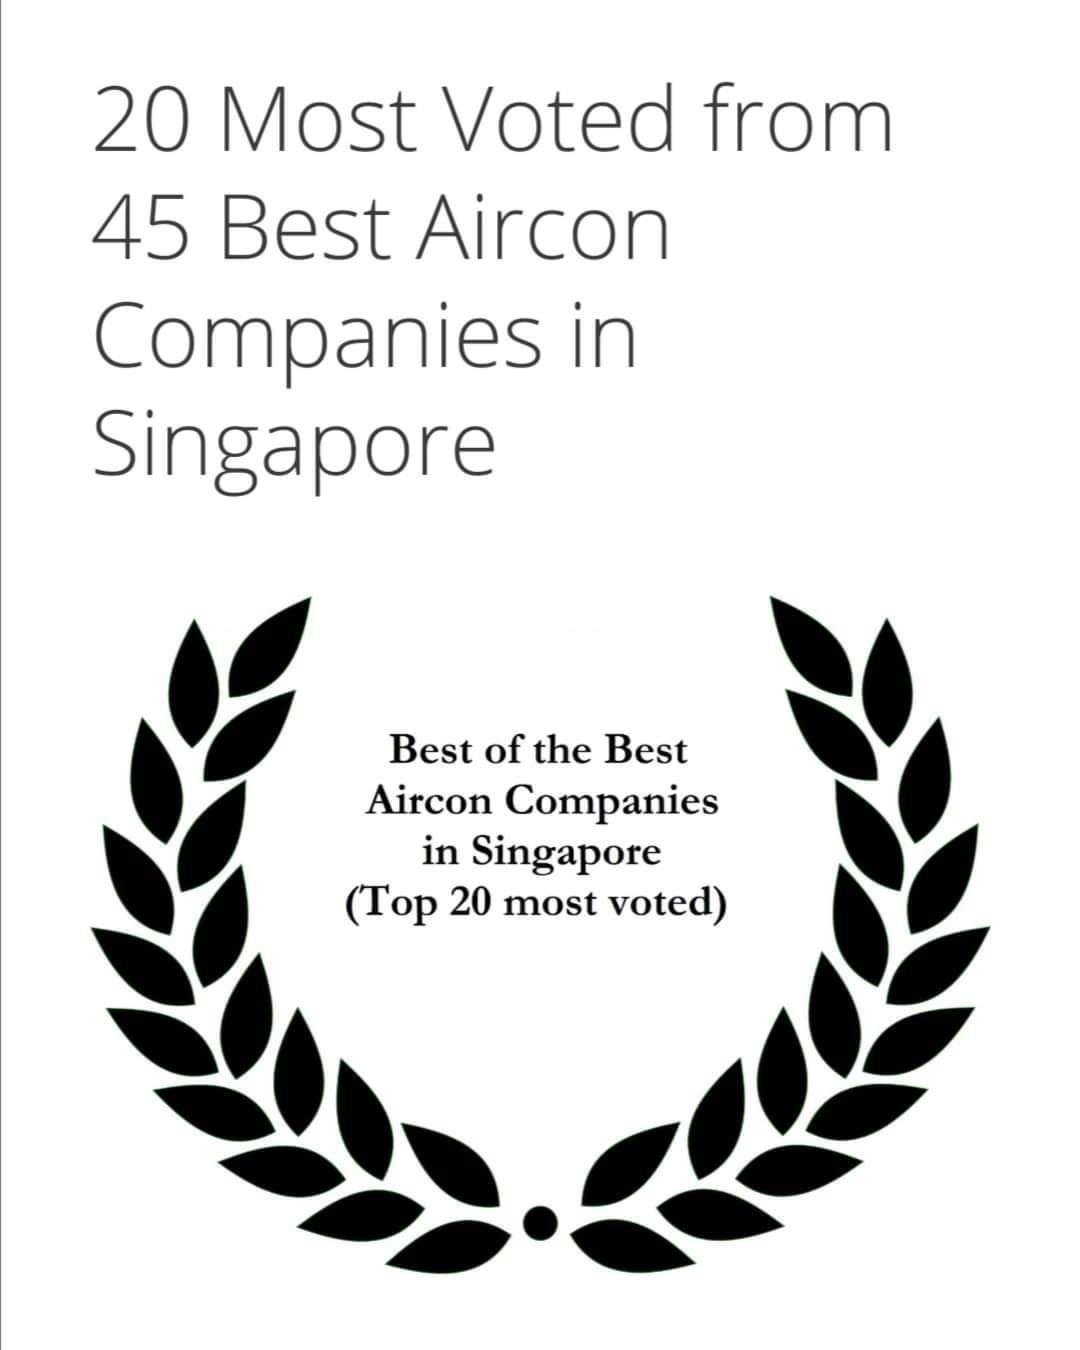 Best of Best Top 20 in Singapore